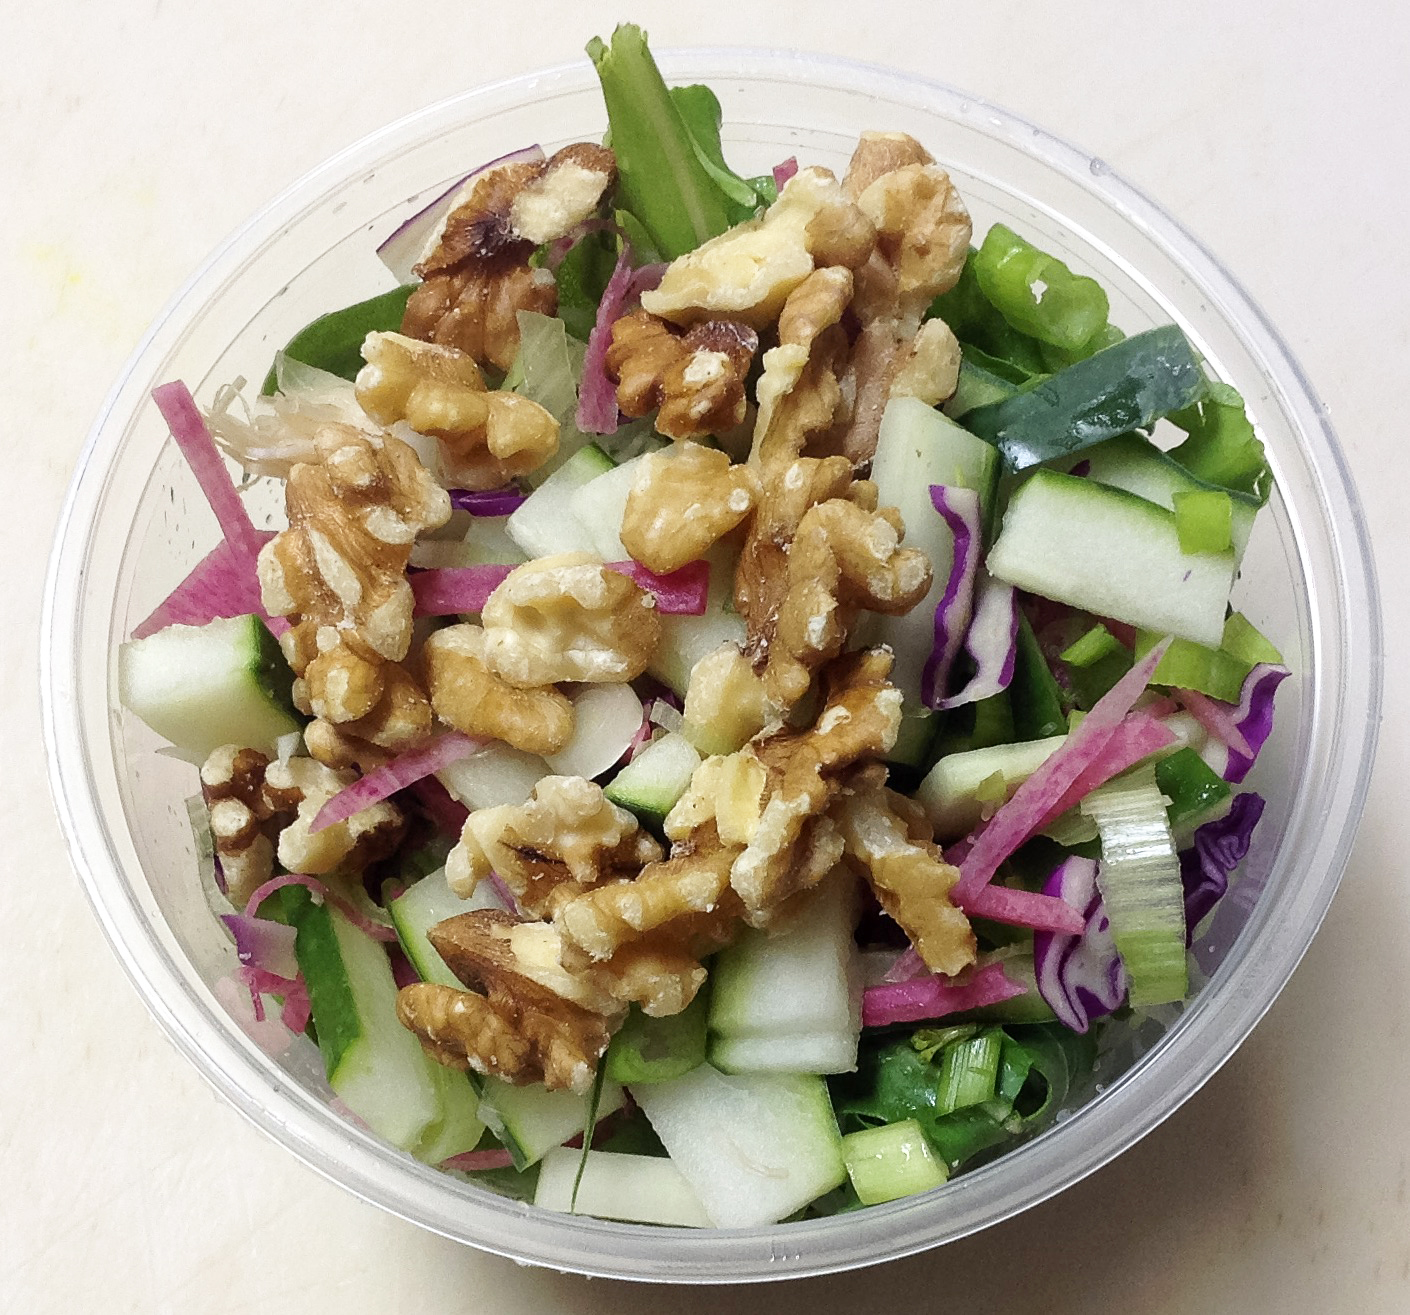 arugula salad with walnuts